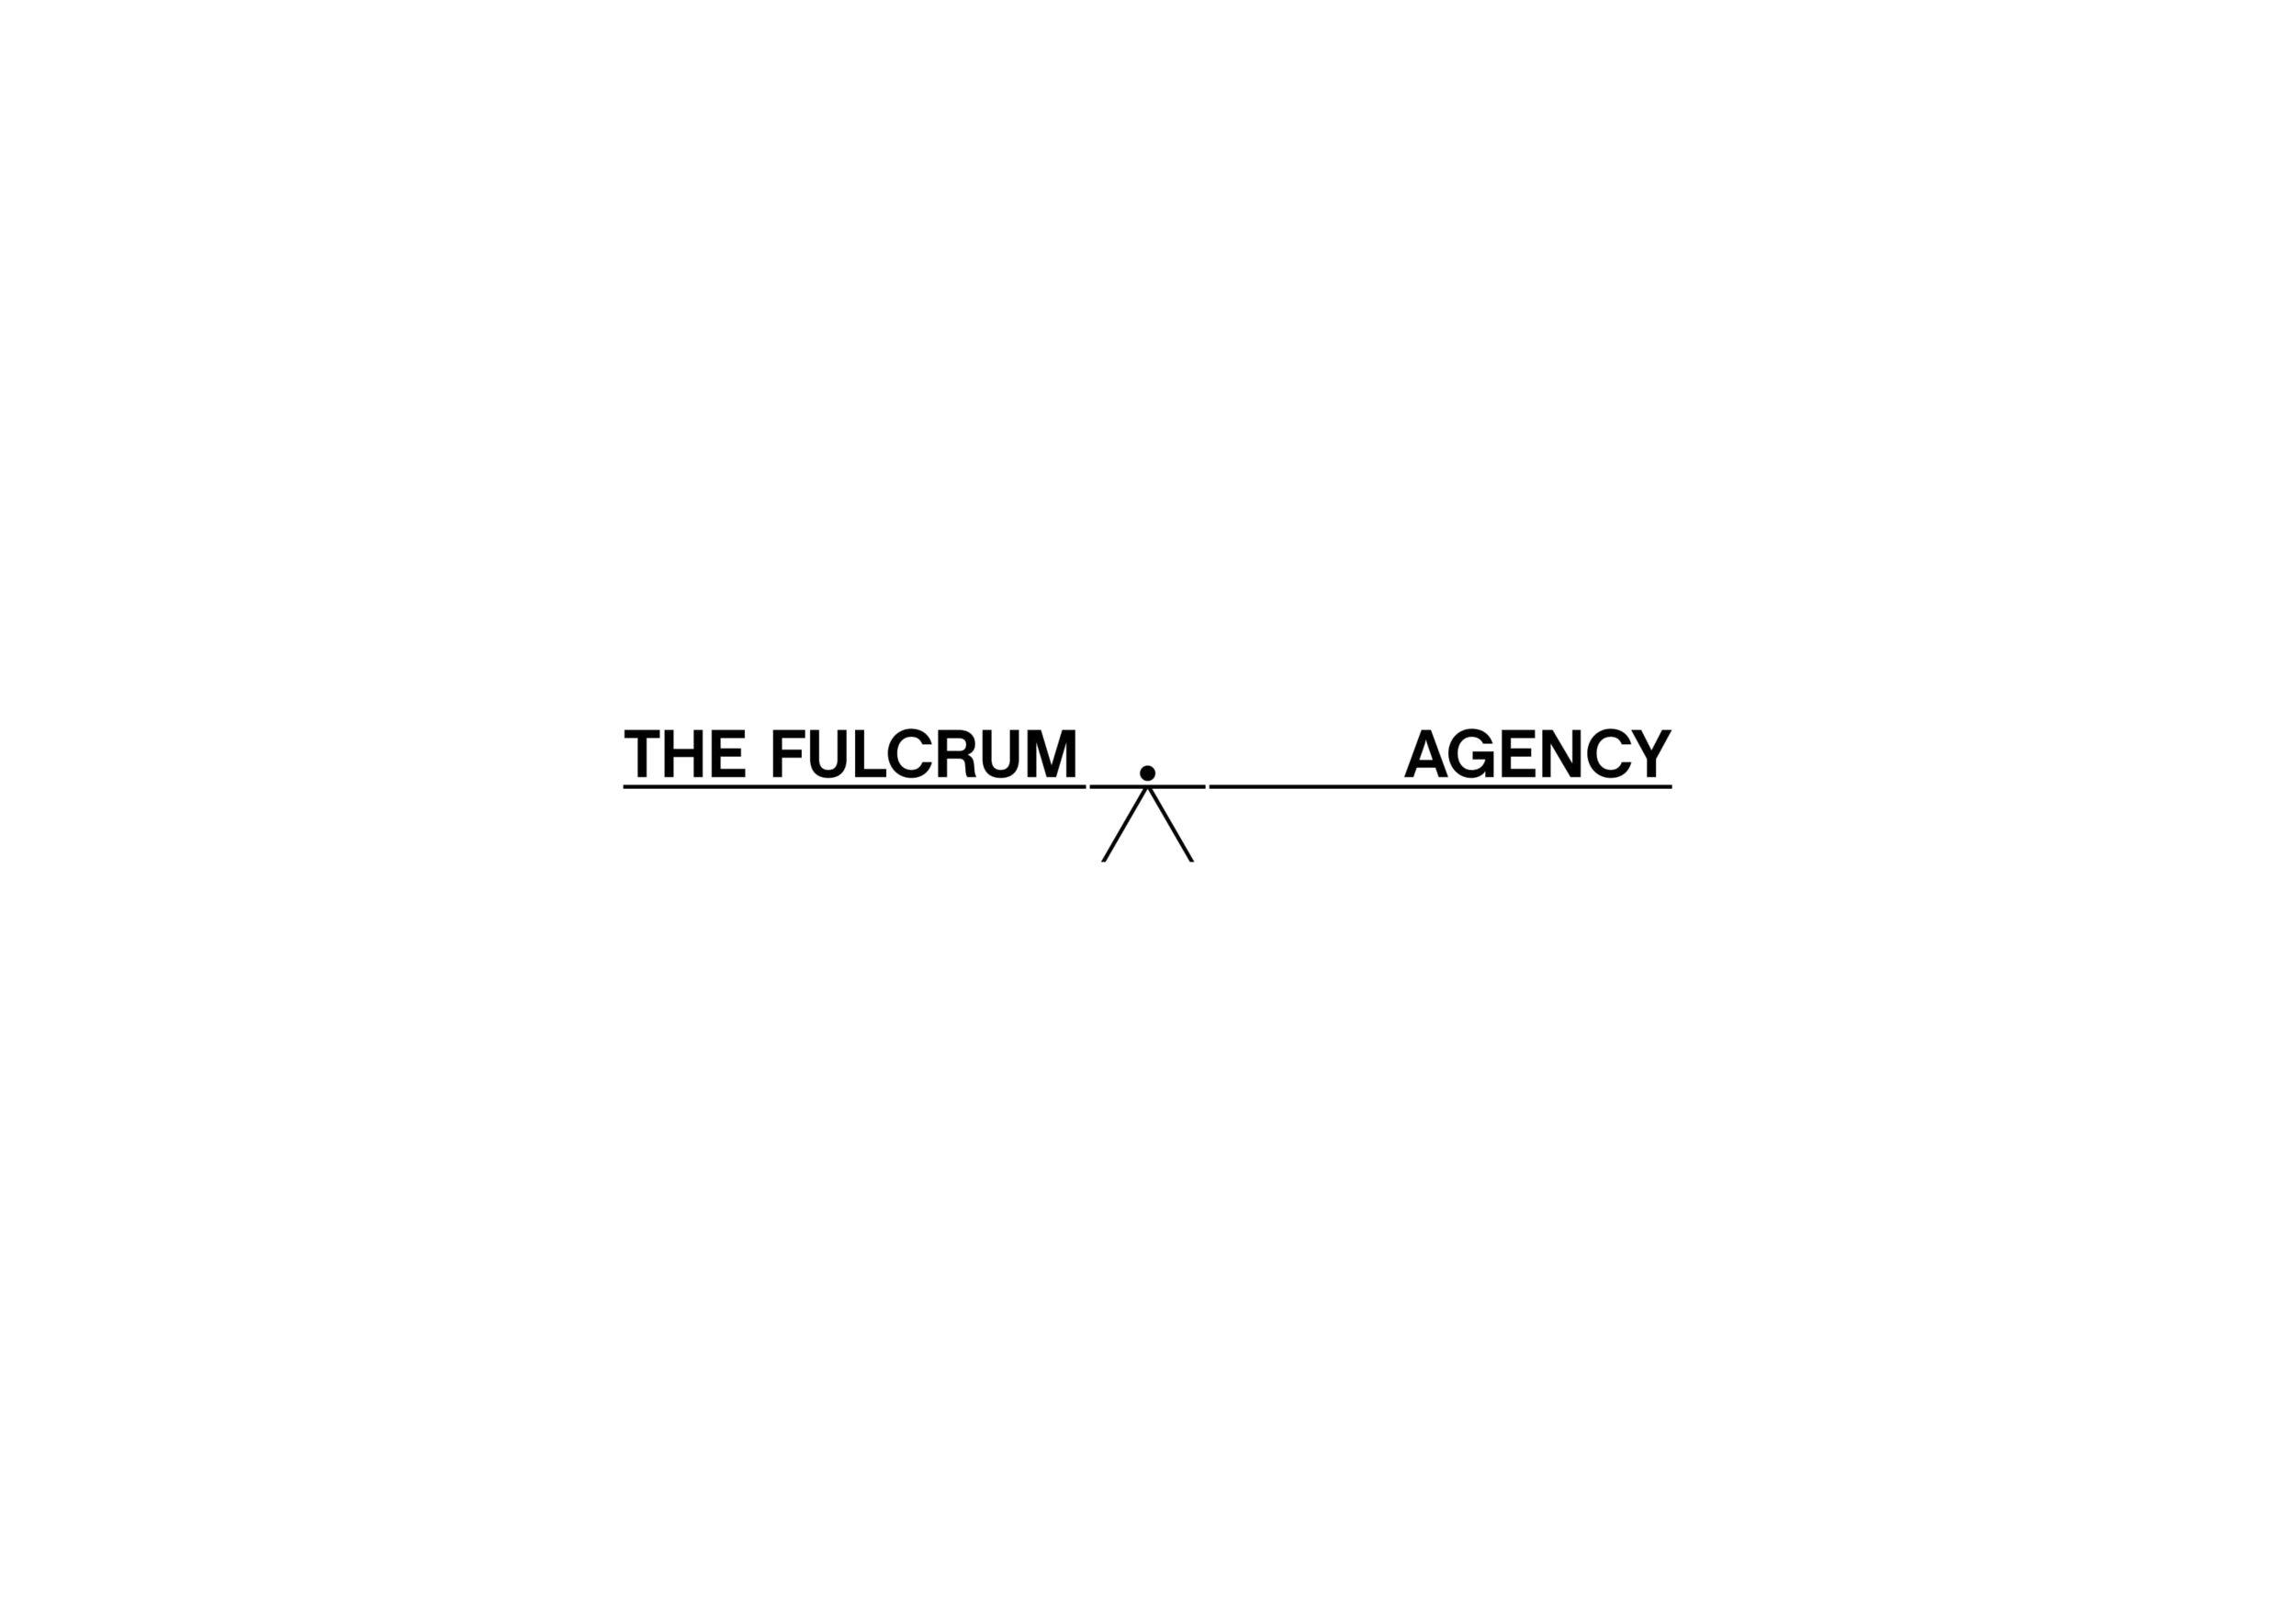 190207 FULCRUM CONCEPT WIP-13.jpg